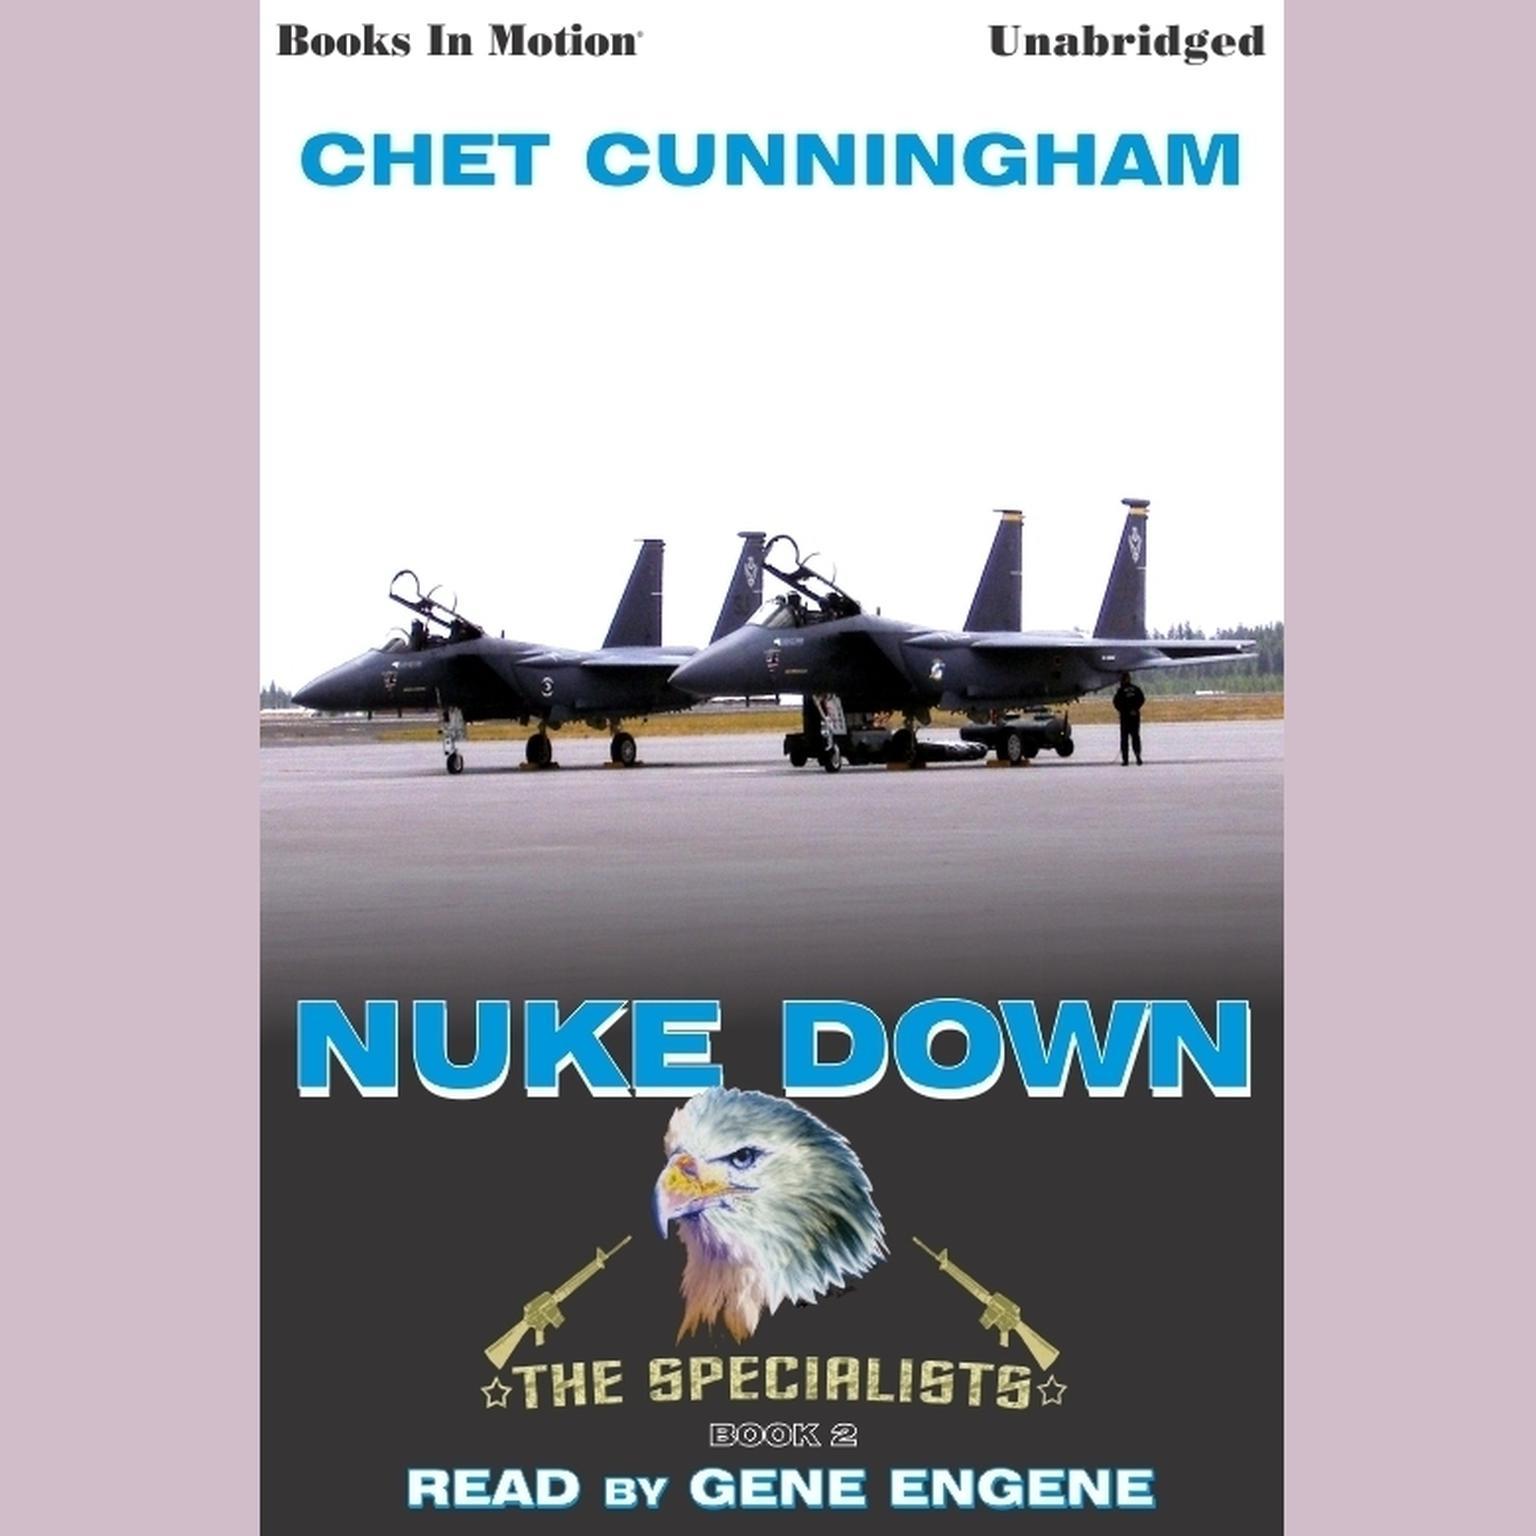 Nuke Down Audiobook, by Chet Cunningham